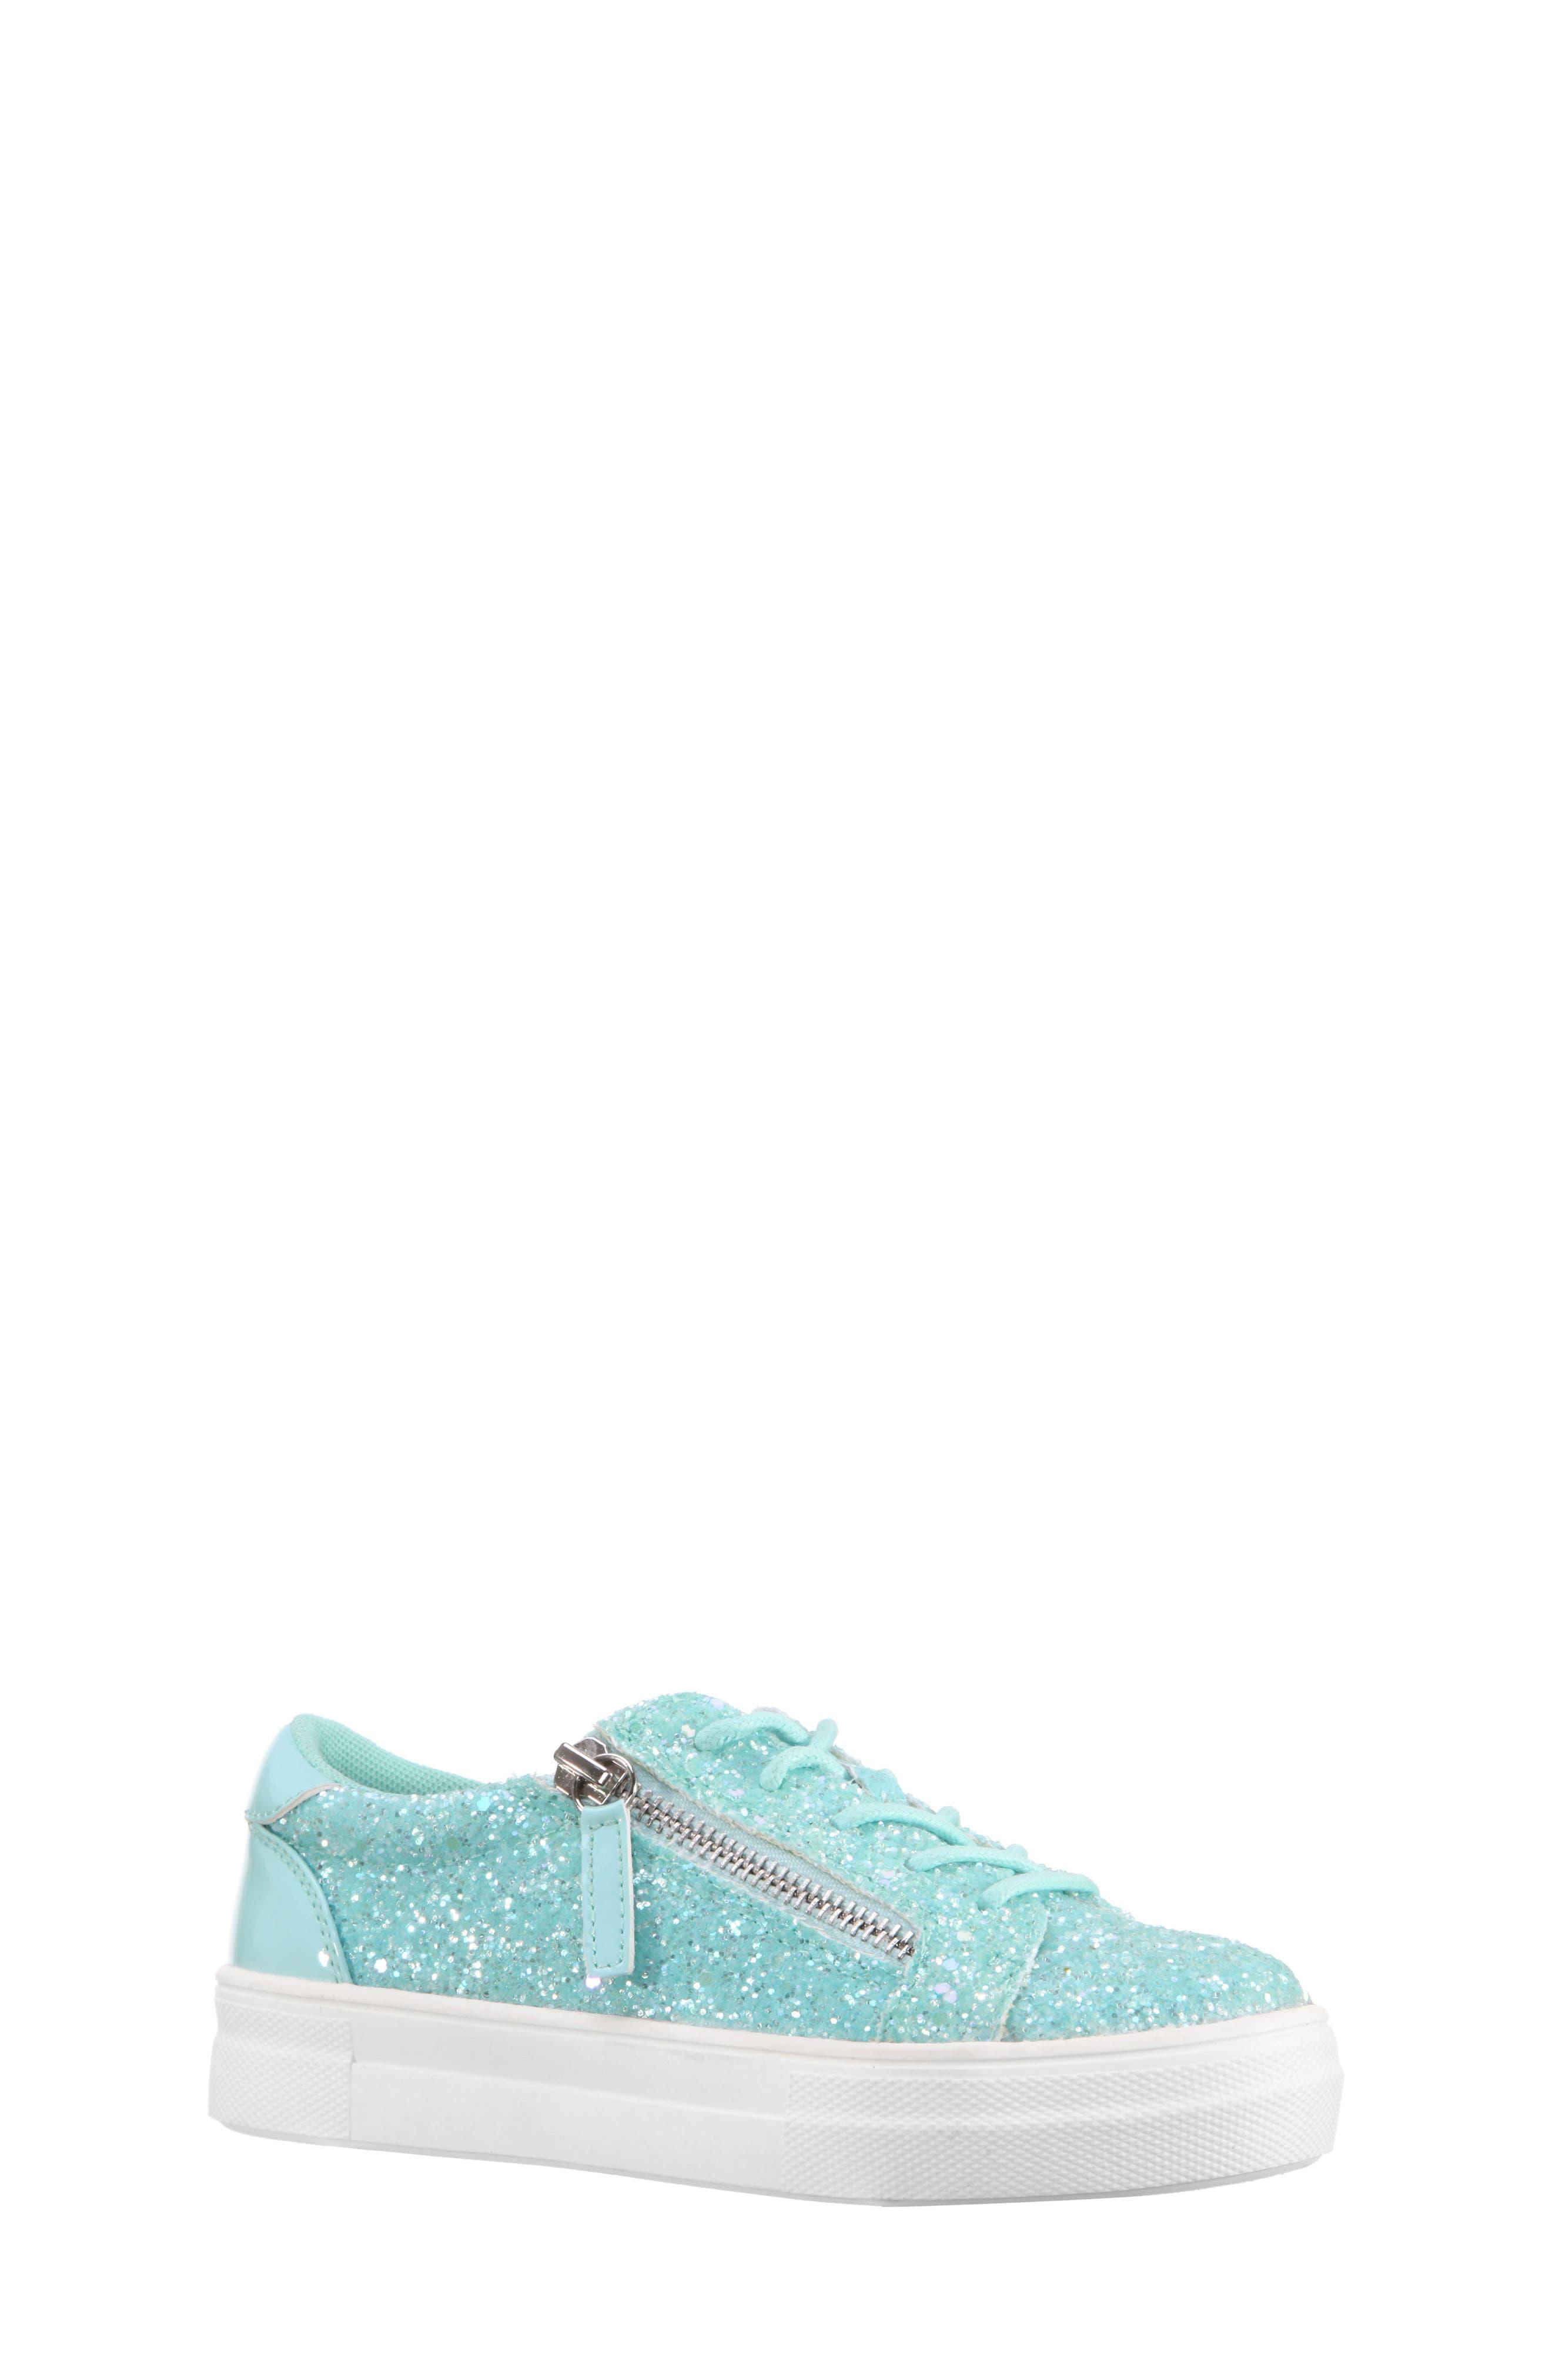 Jennalyn Glitter Sneaker,                             Main thumbnail 1, color,                             440